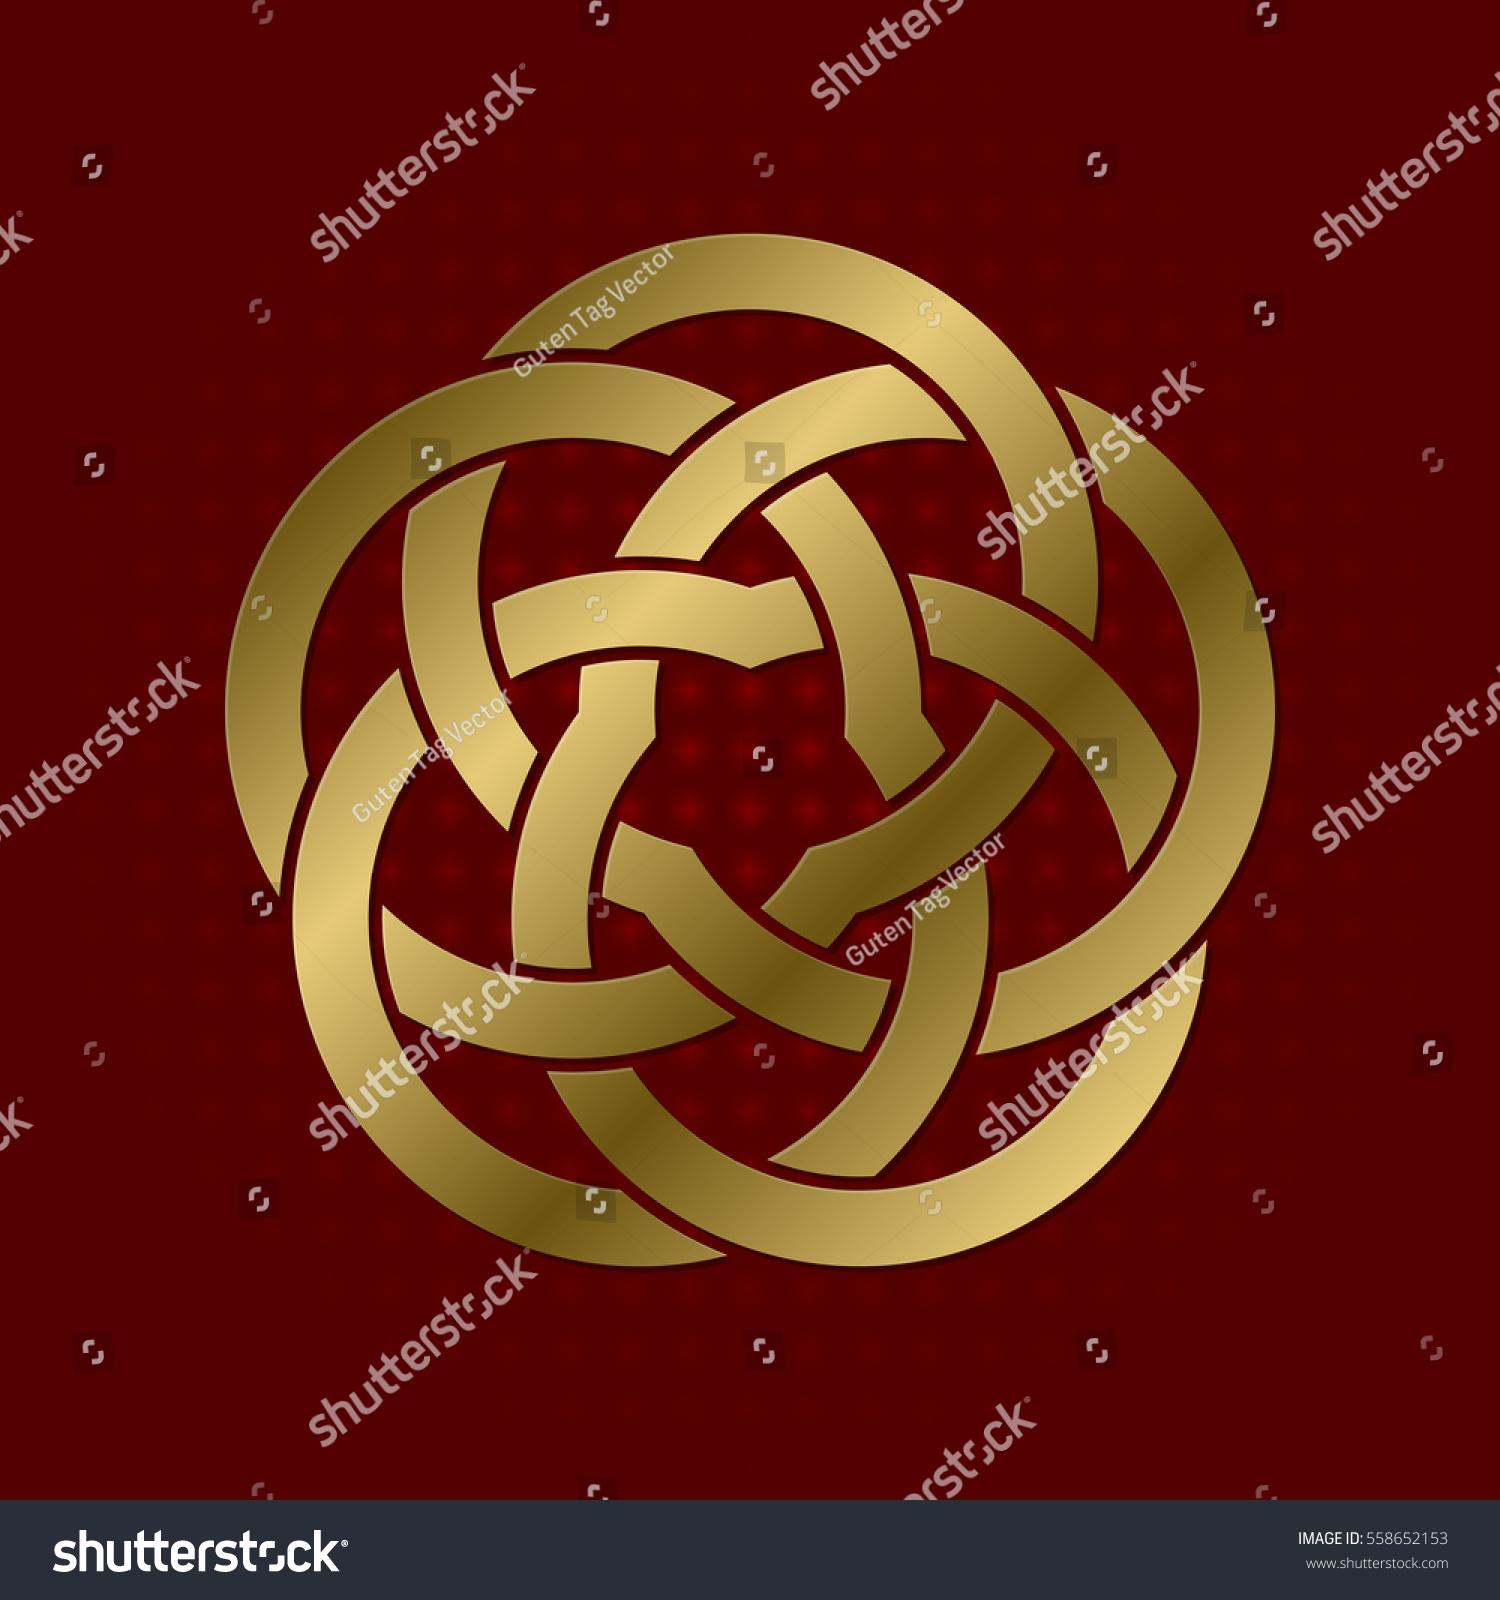 Symbol for five choice image symbol and sign ideas sacred geometric symbol five petals plexus stock vector 558652153 sacred geometric symbol of five petals plexus biocorpaavc